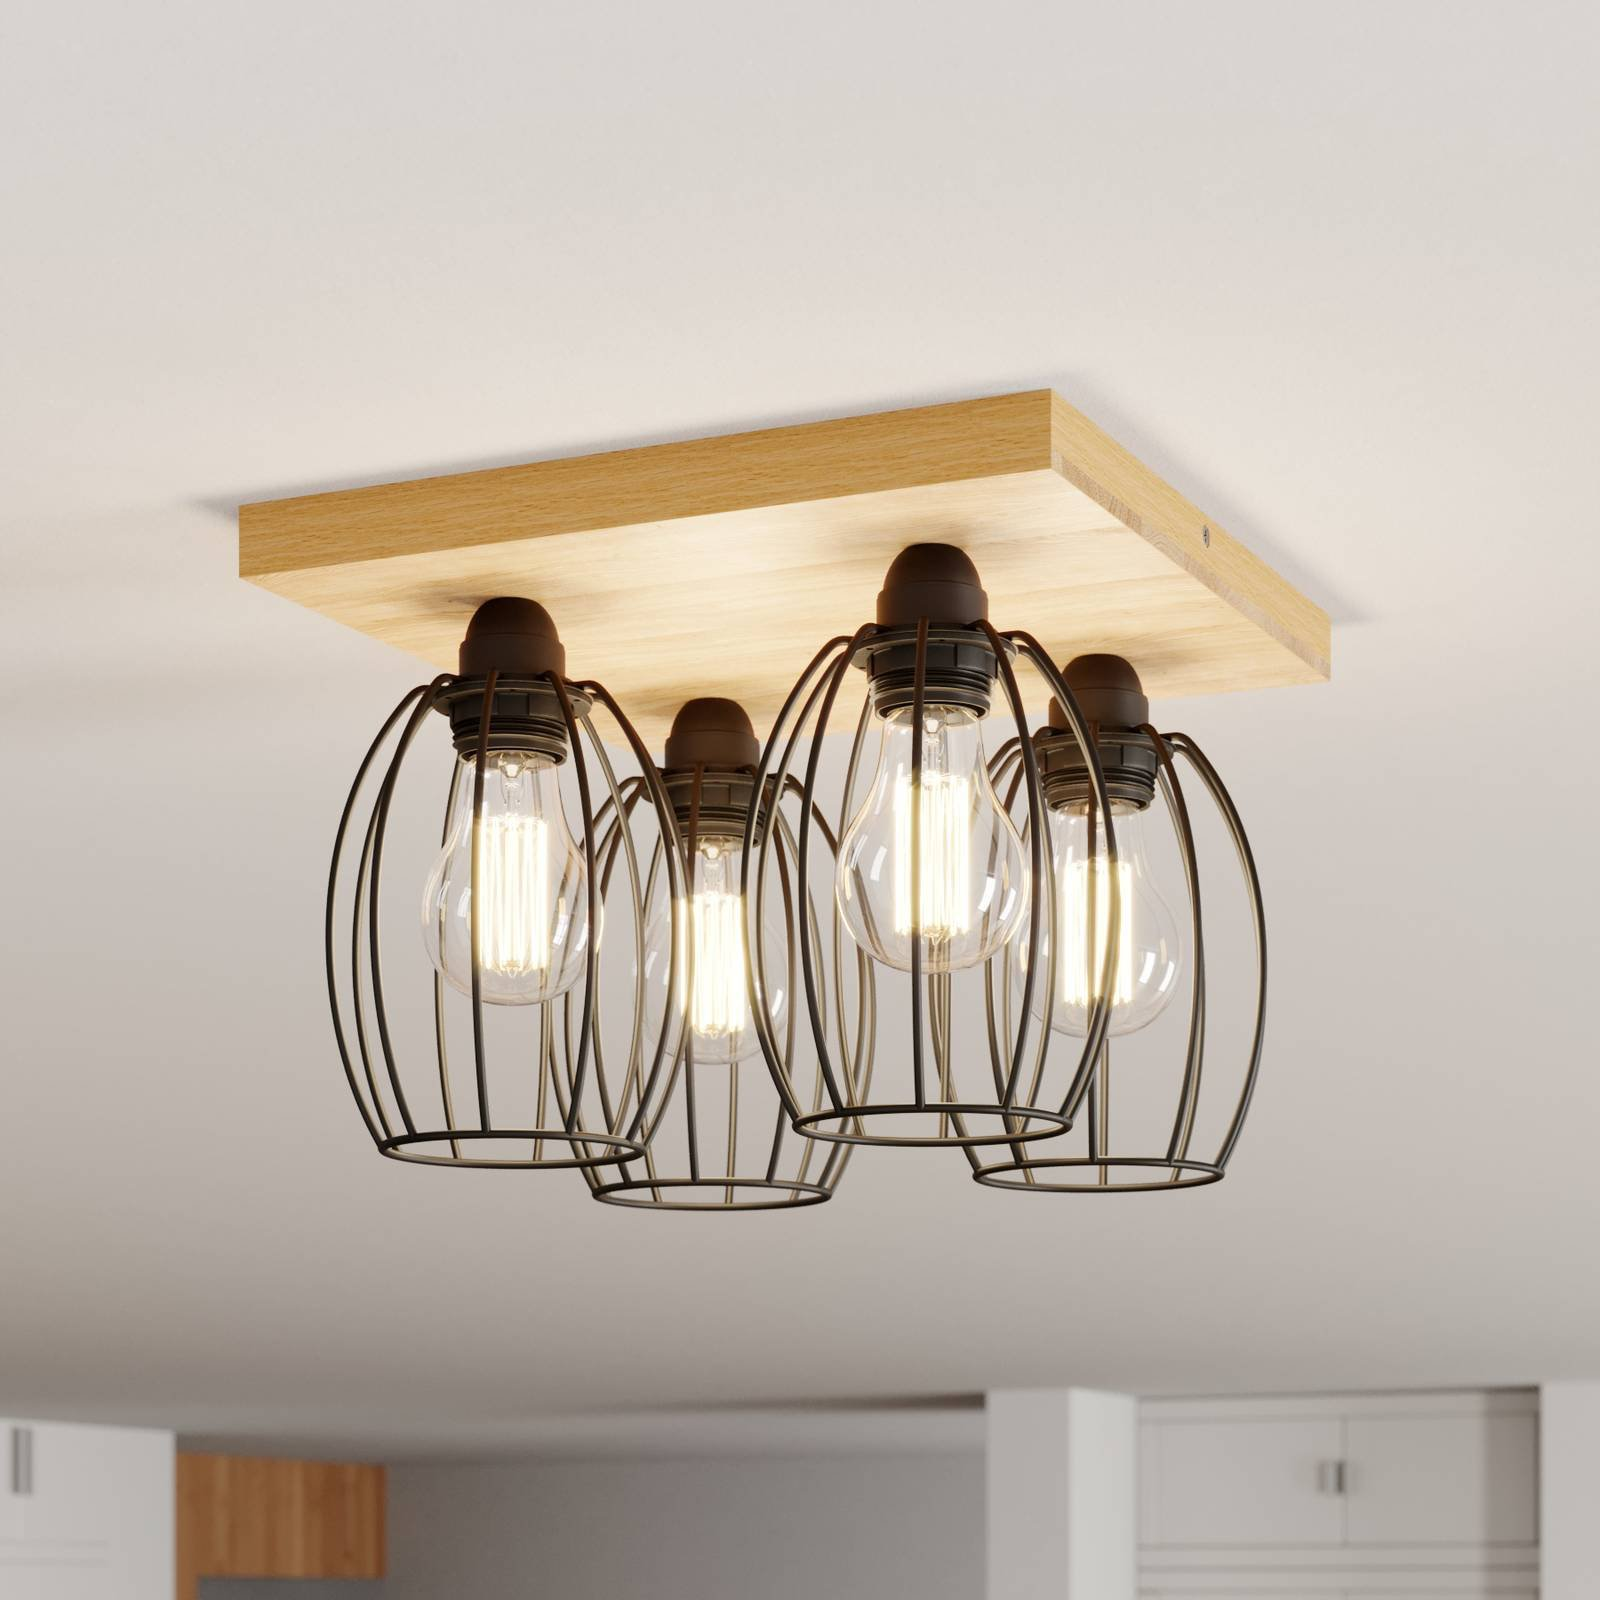 Taklampe Beevly, tre og metall, 4 lyskilder